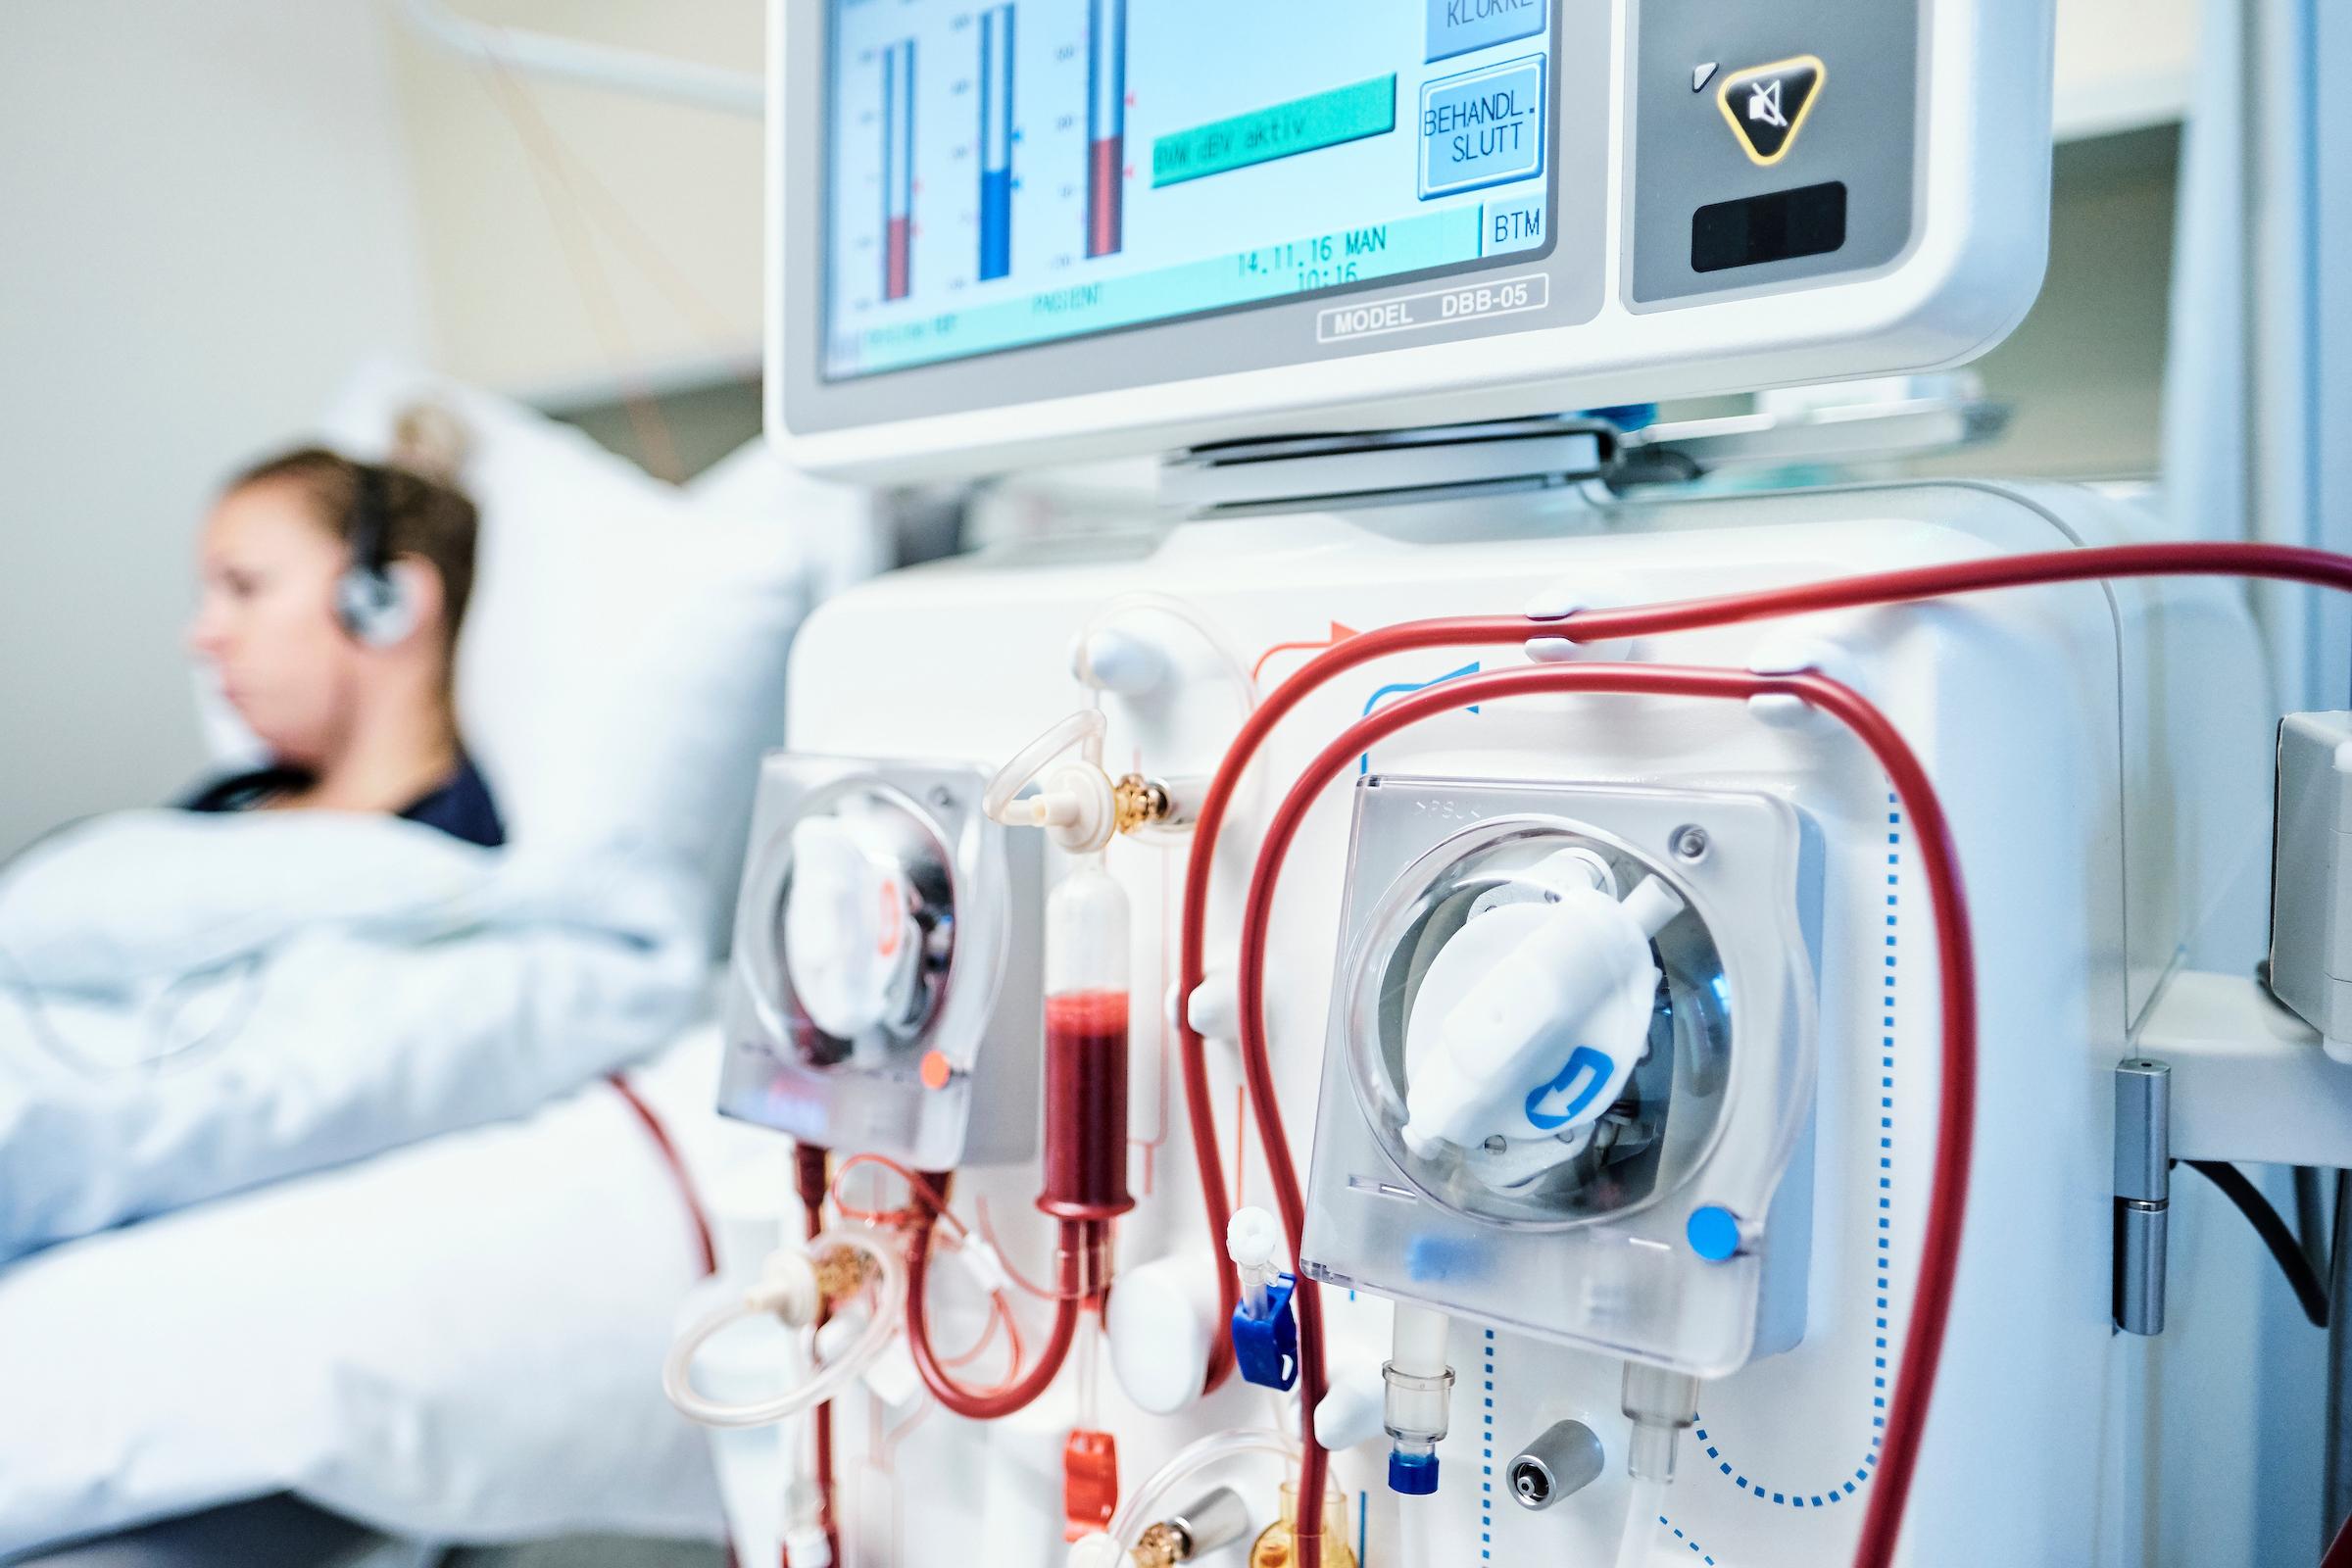 Person koblet til dialysemaskin